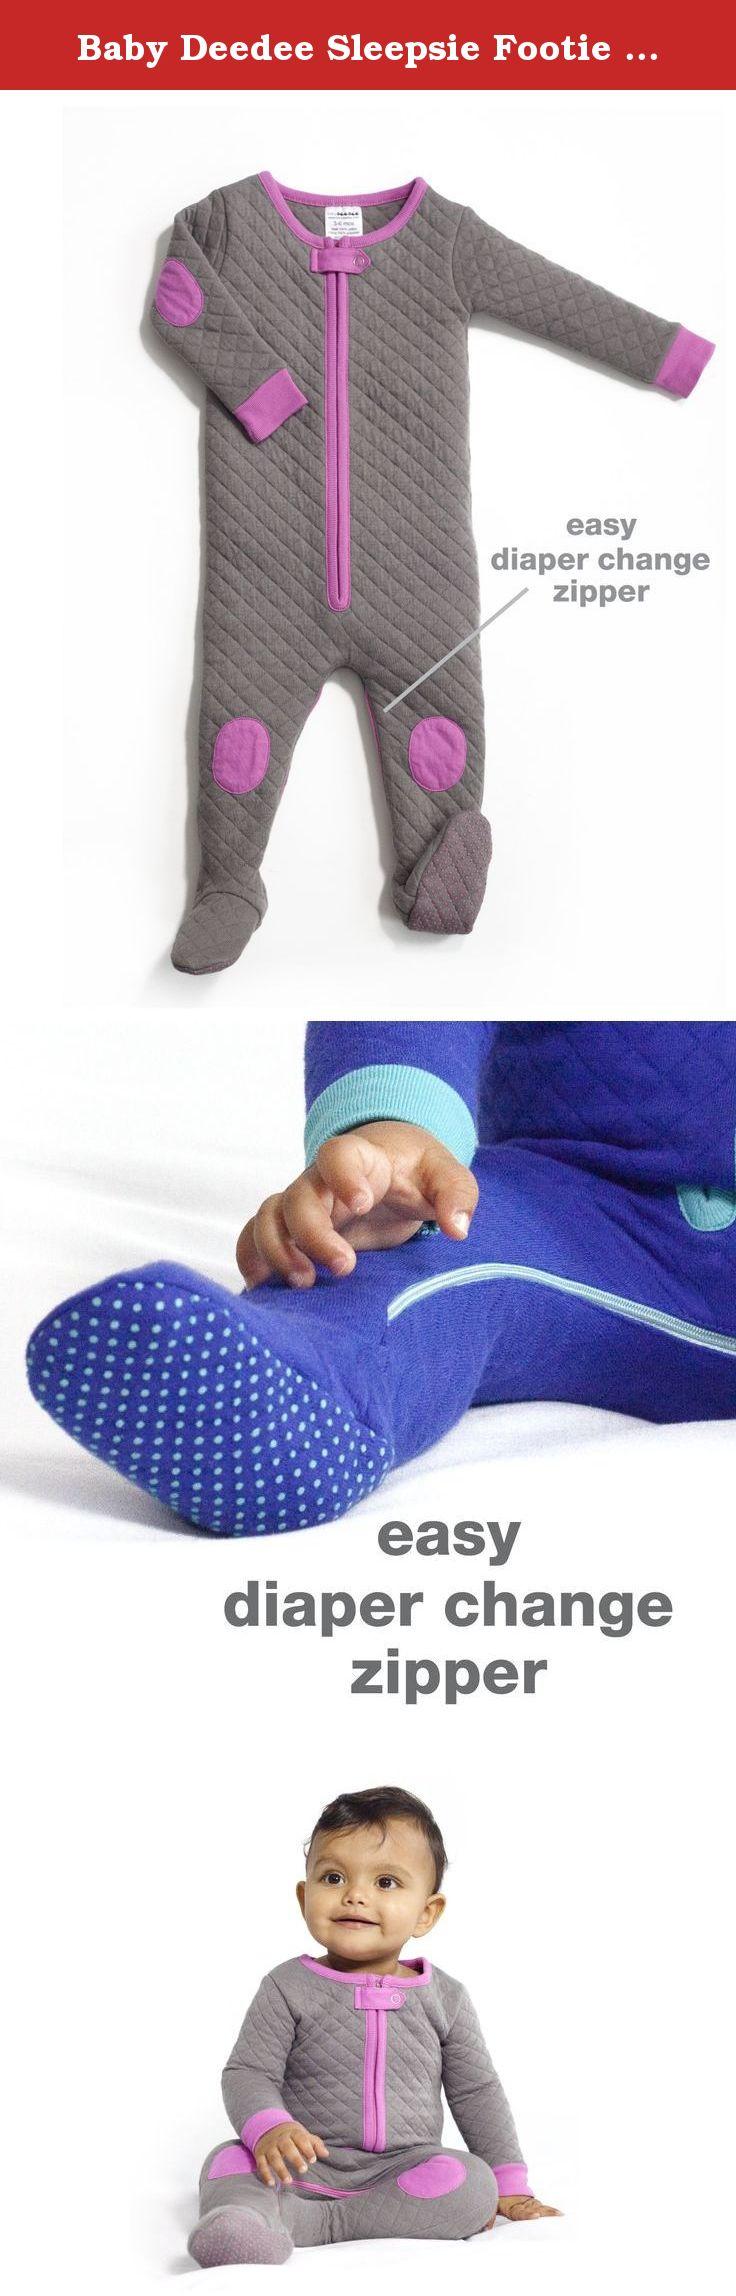 70532ba4cc0 Baby Deedee Sleepsie Footie Pajamas